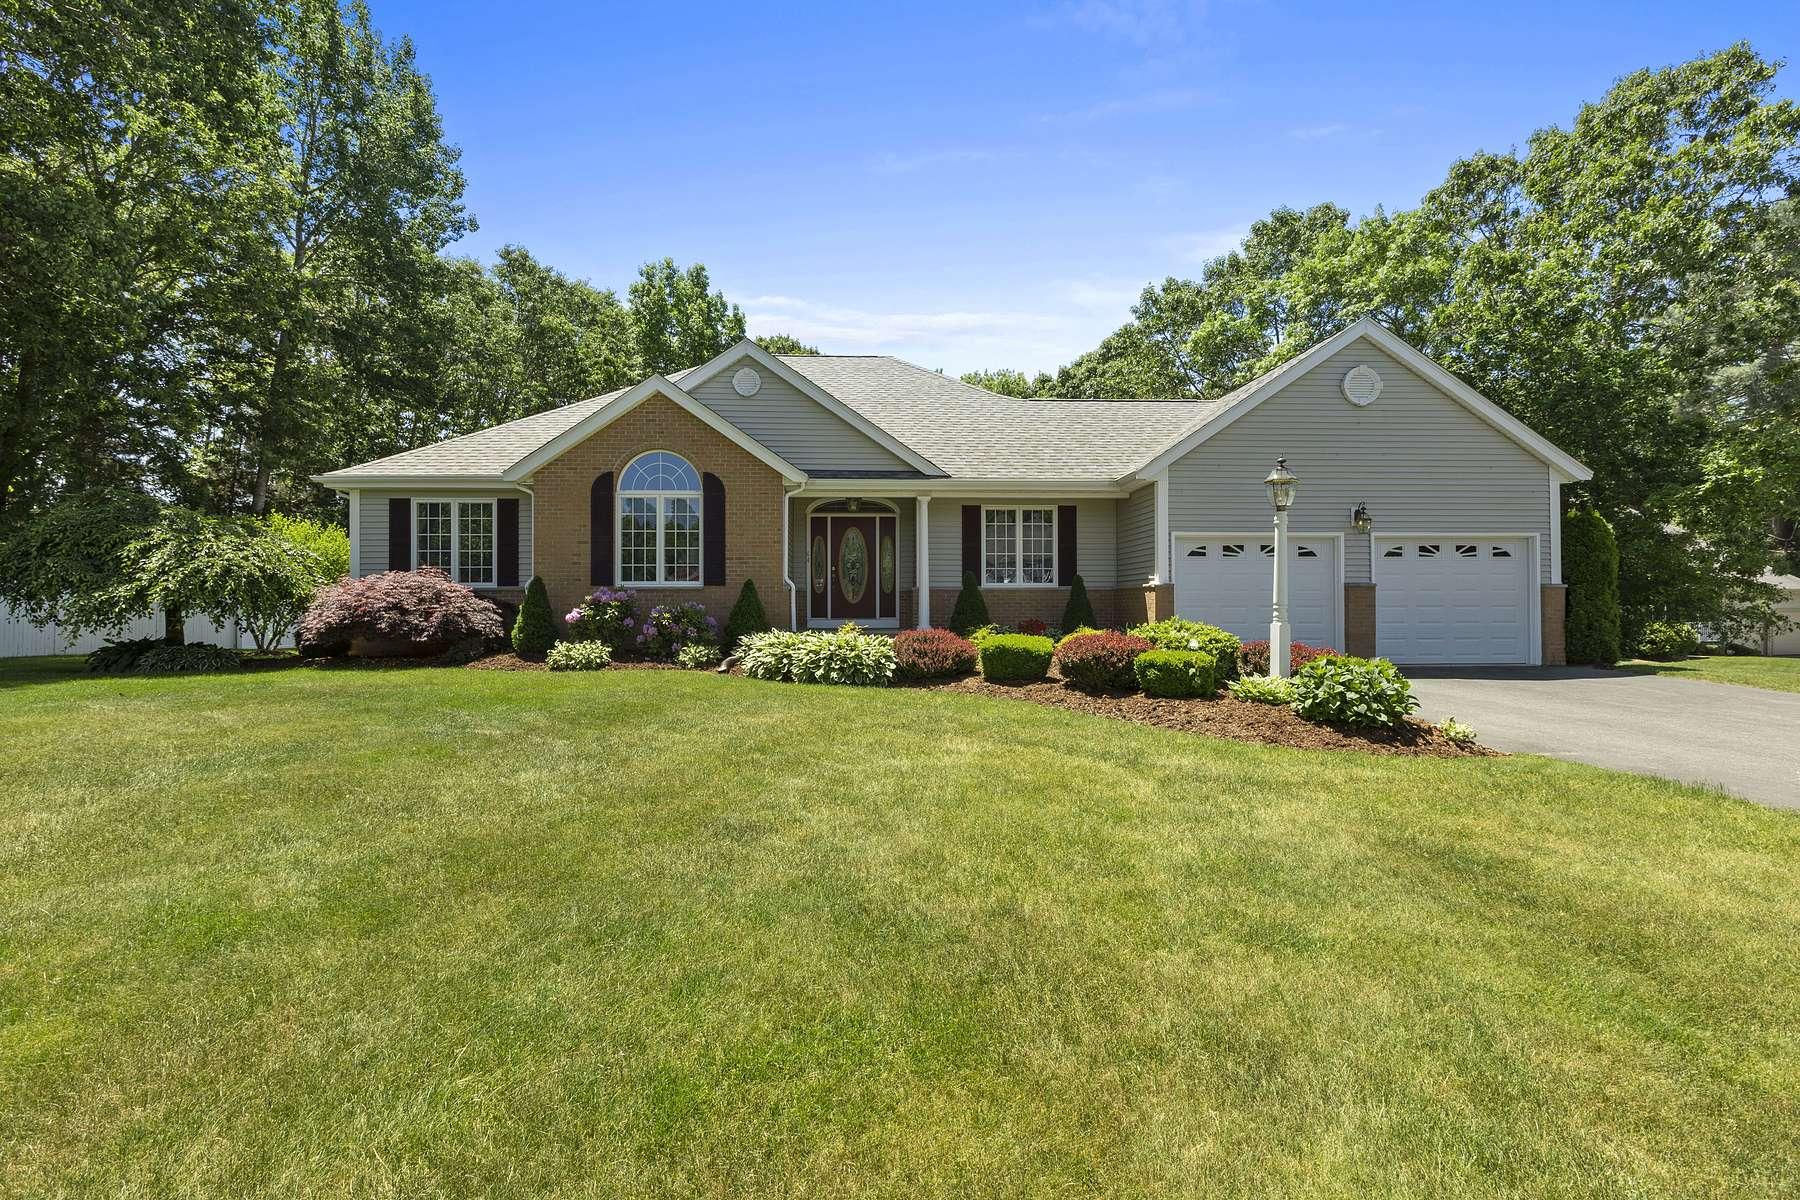 Single Family Homes for Sale at 64 Twin Brook Lane, Taunton 64 Twin Brook Ln Taunton, Massachusetts 02780 United States